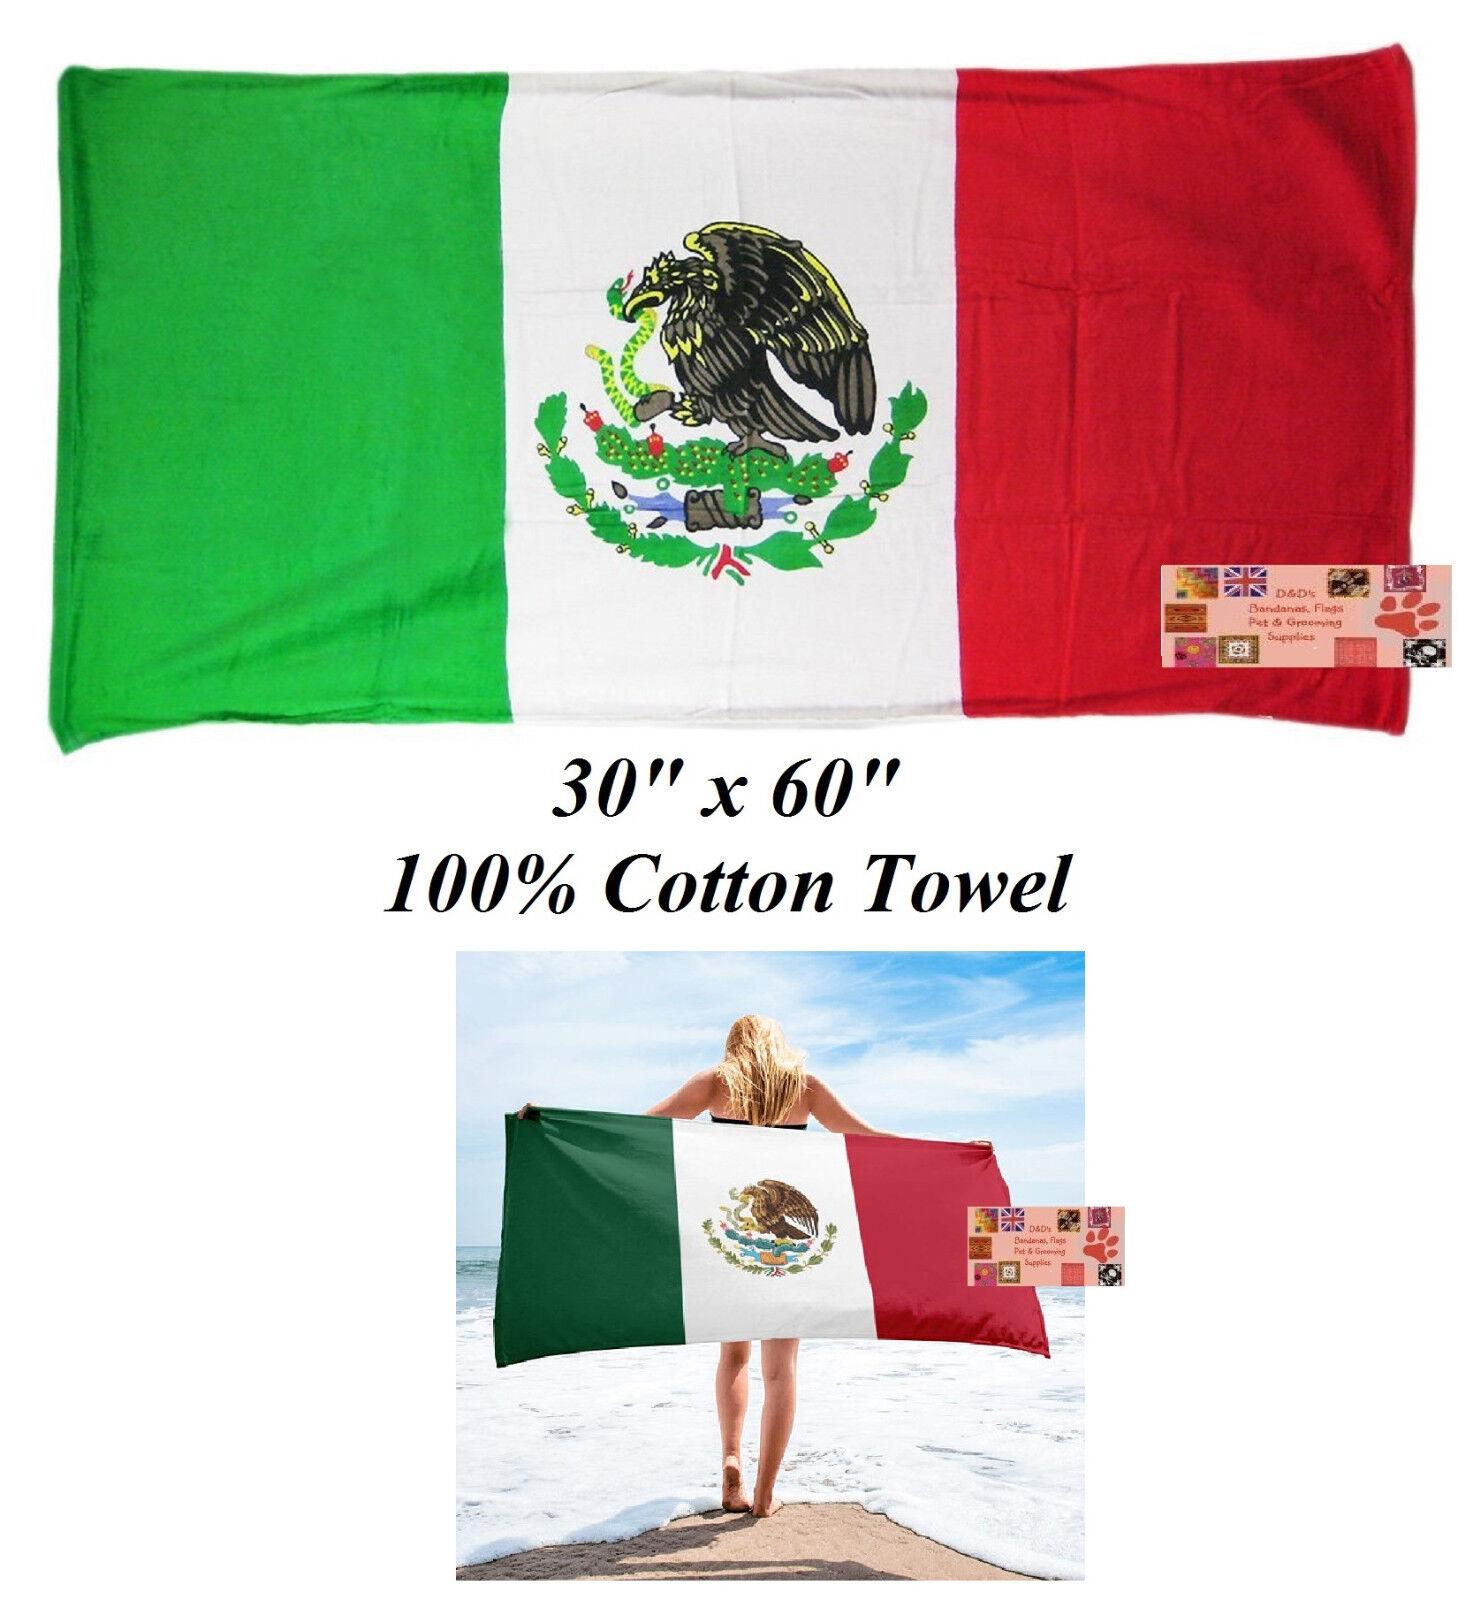 TIE DYE LOVE RAINBOW COLOR FLAG Beach Bath POOL GYM PARTY Towel HAPPY COOL 30x60